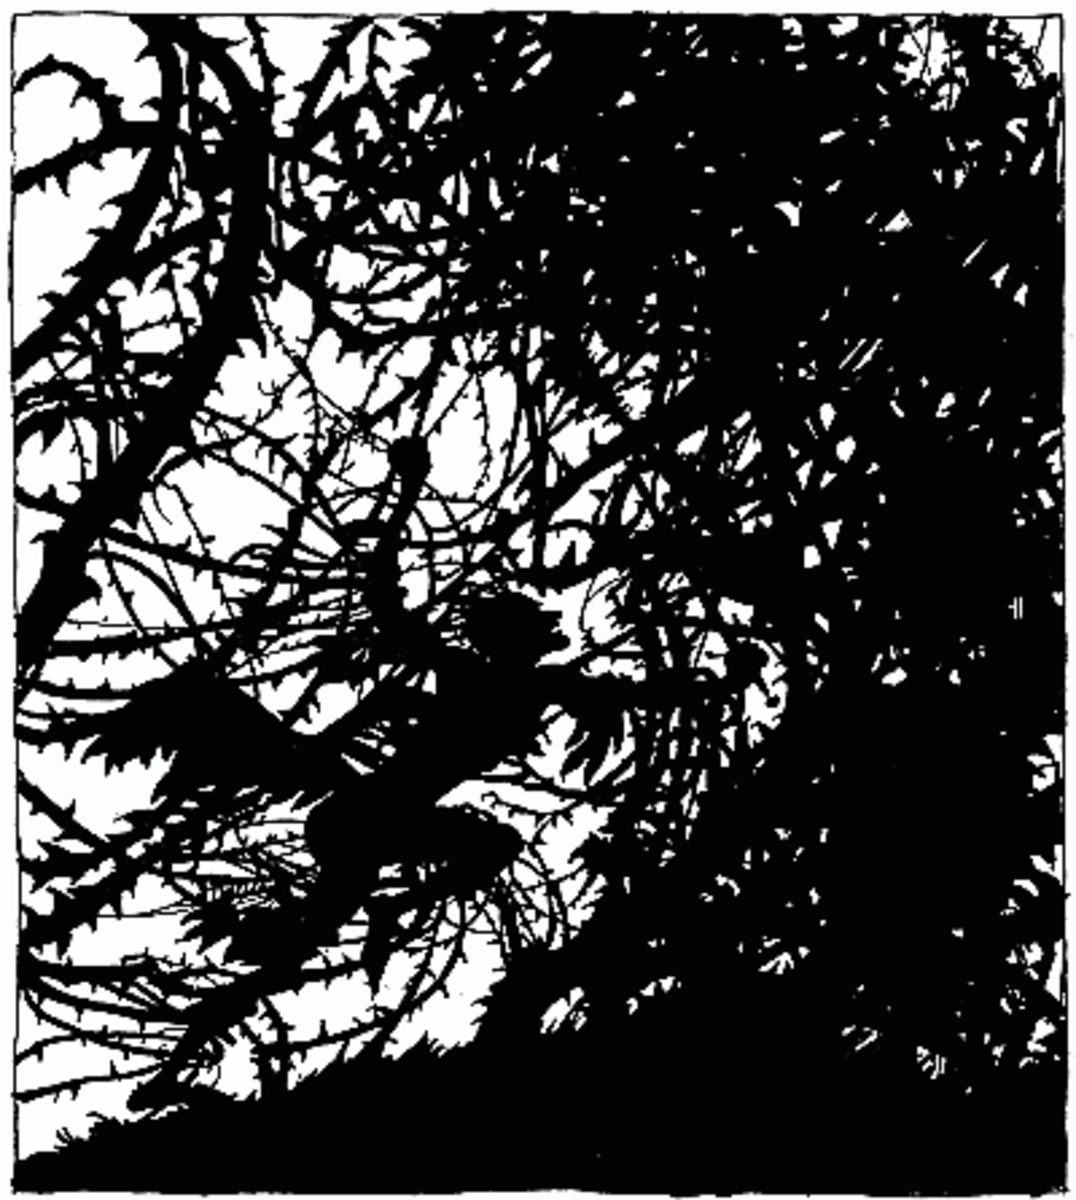 The brambles from Sleeping Beauty by Arthur Rackham